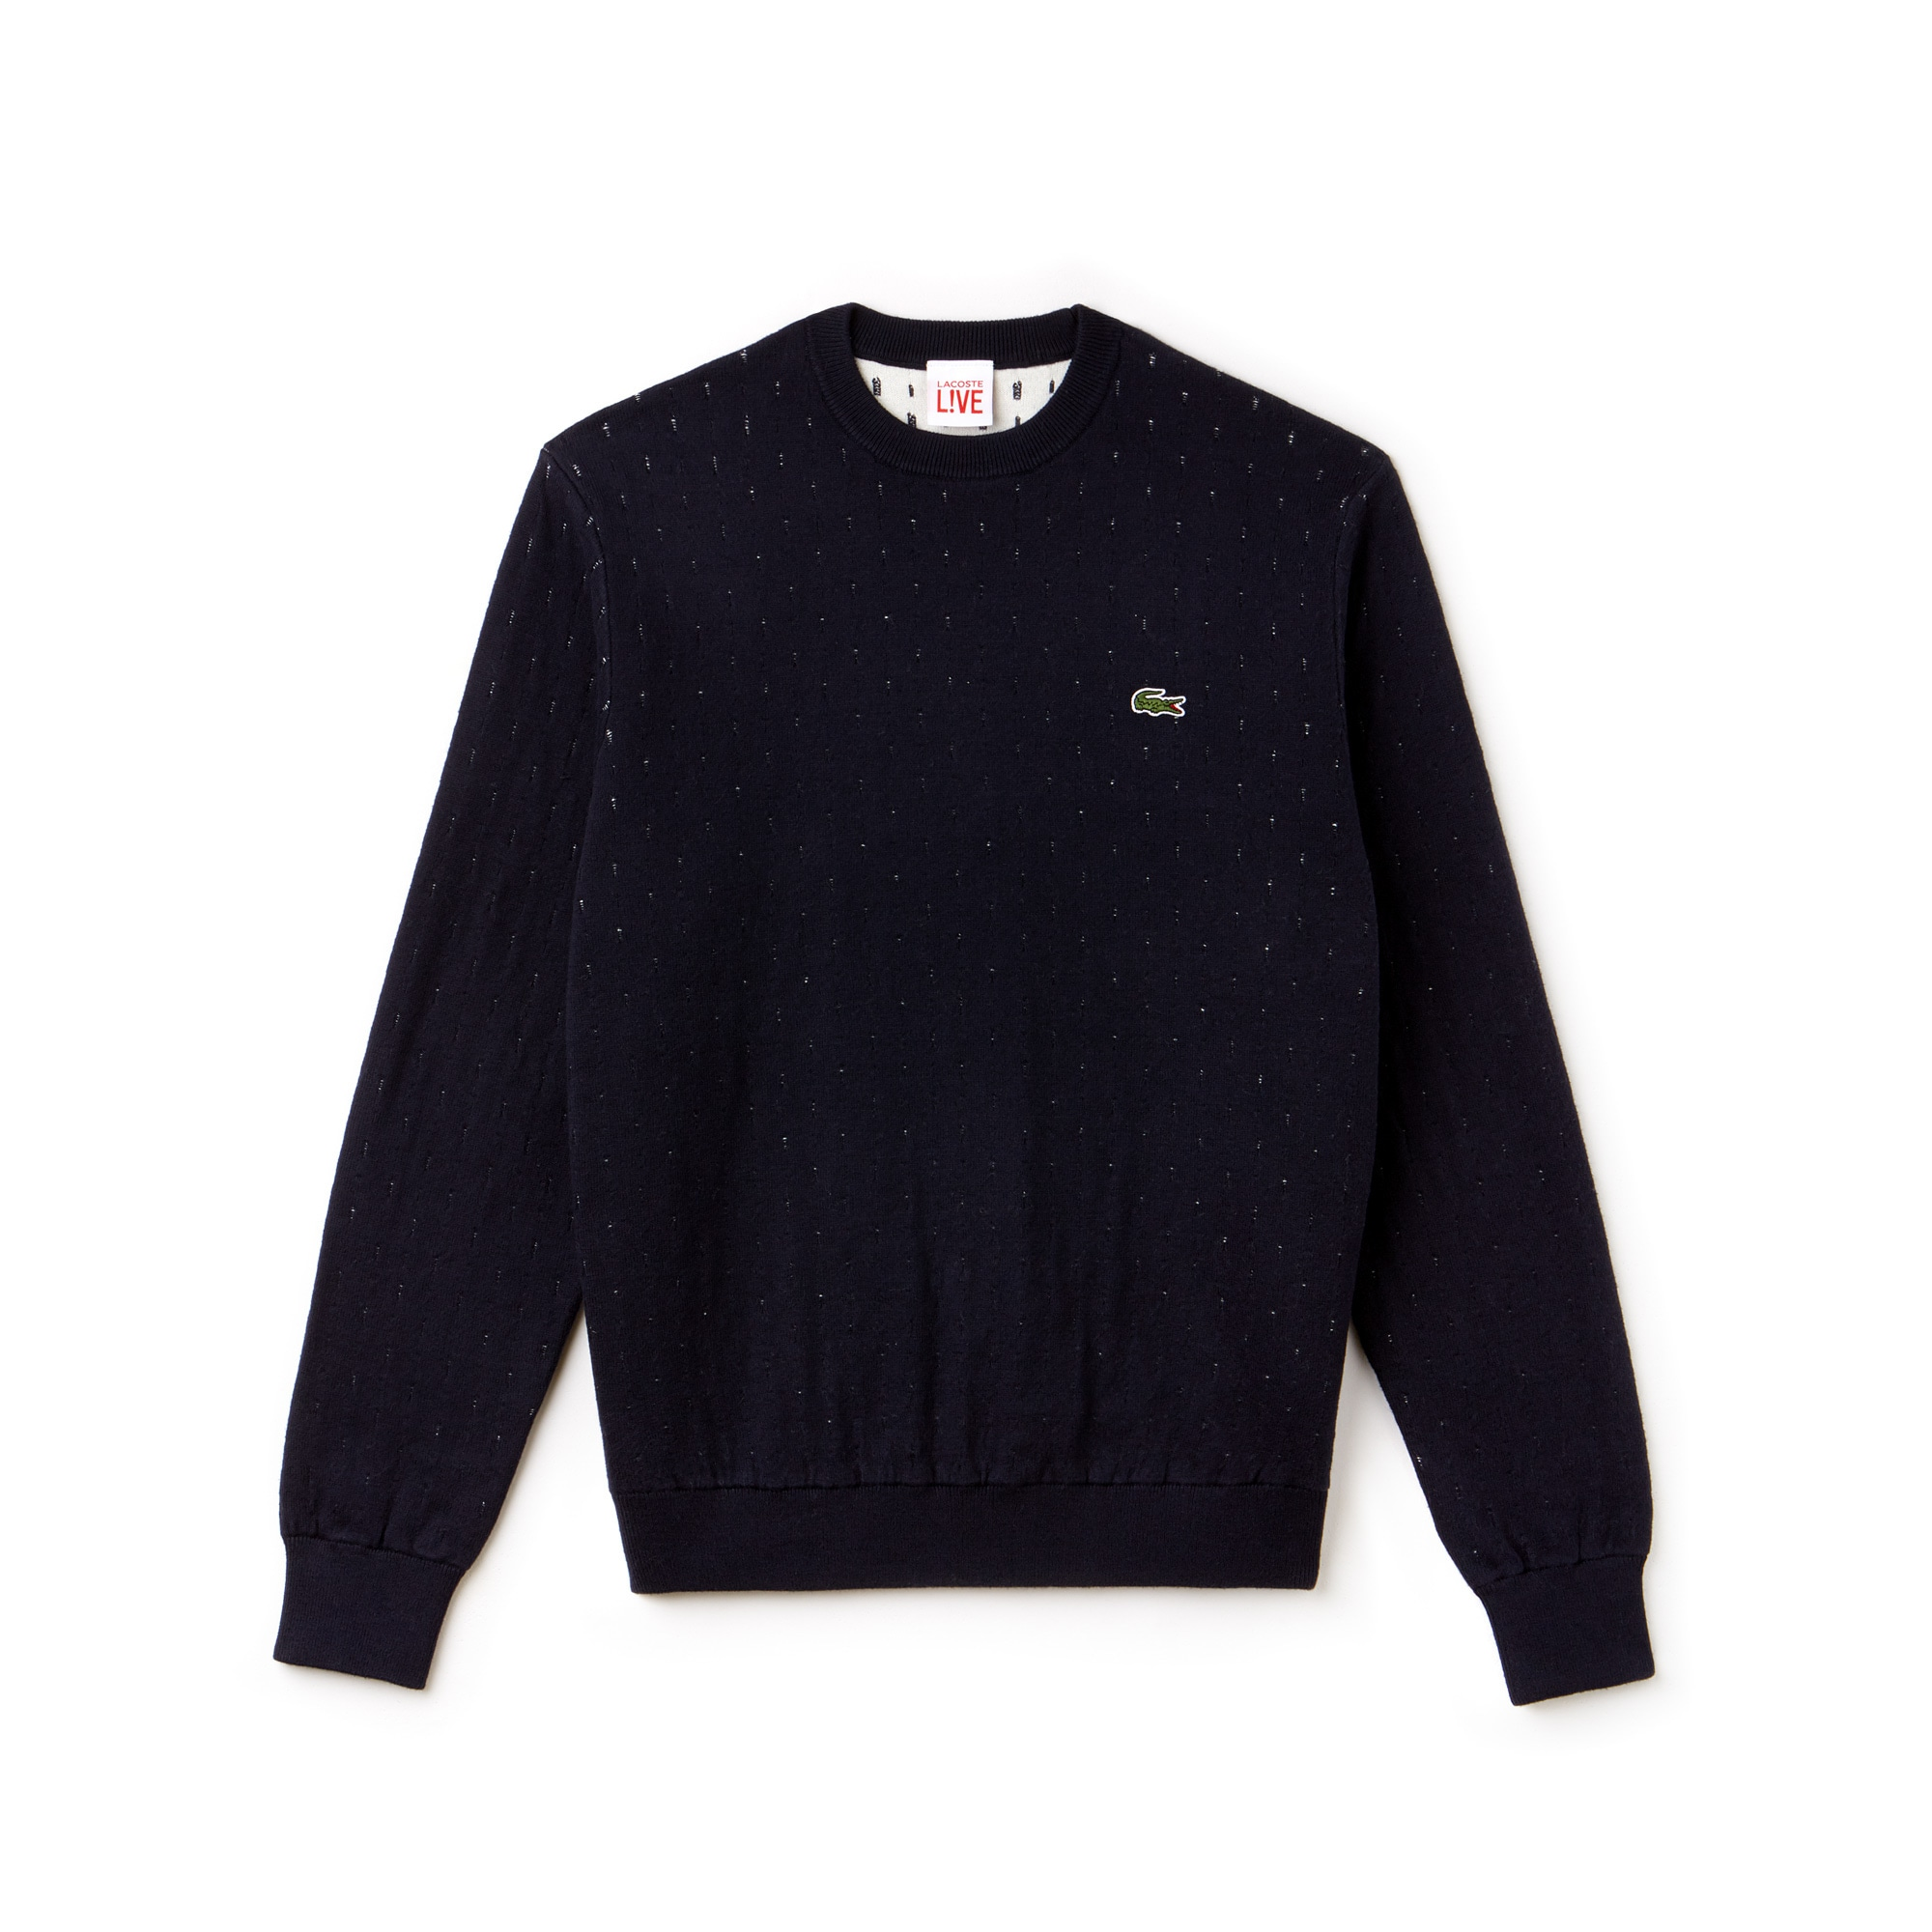 Lacoste LIVE系列棉和羊绒混纺提花织物男士圆领毛衣